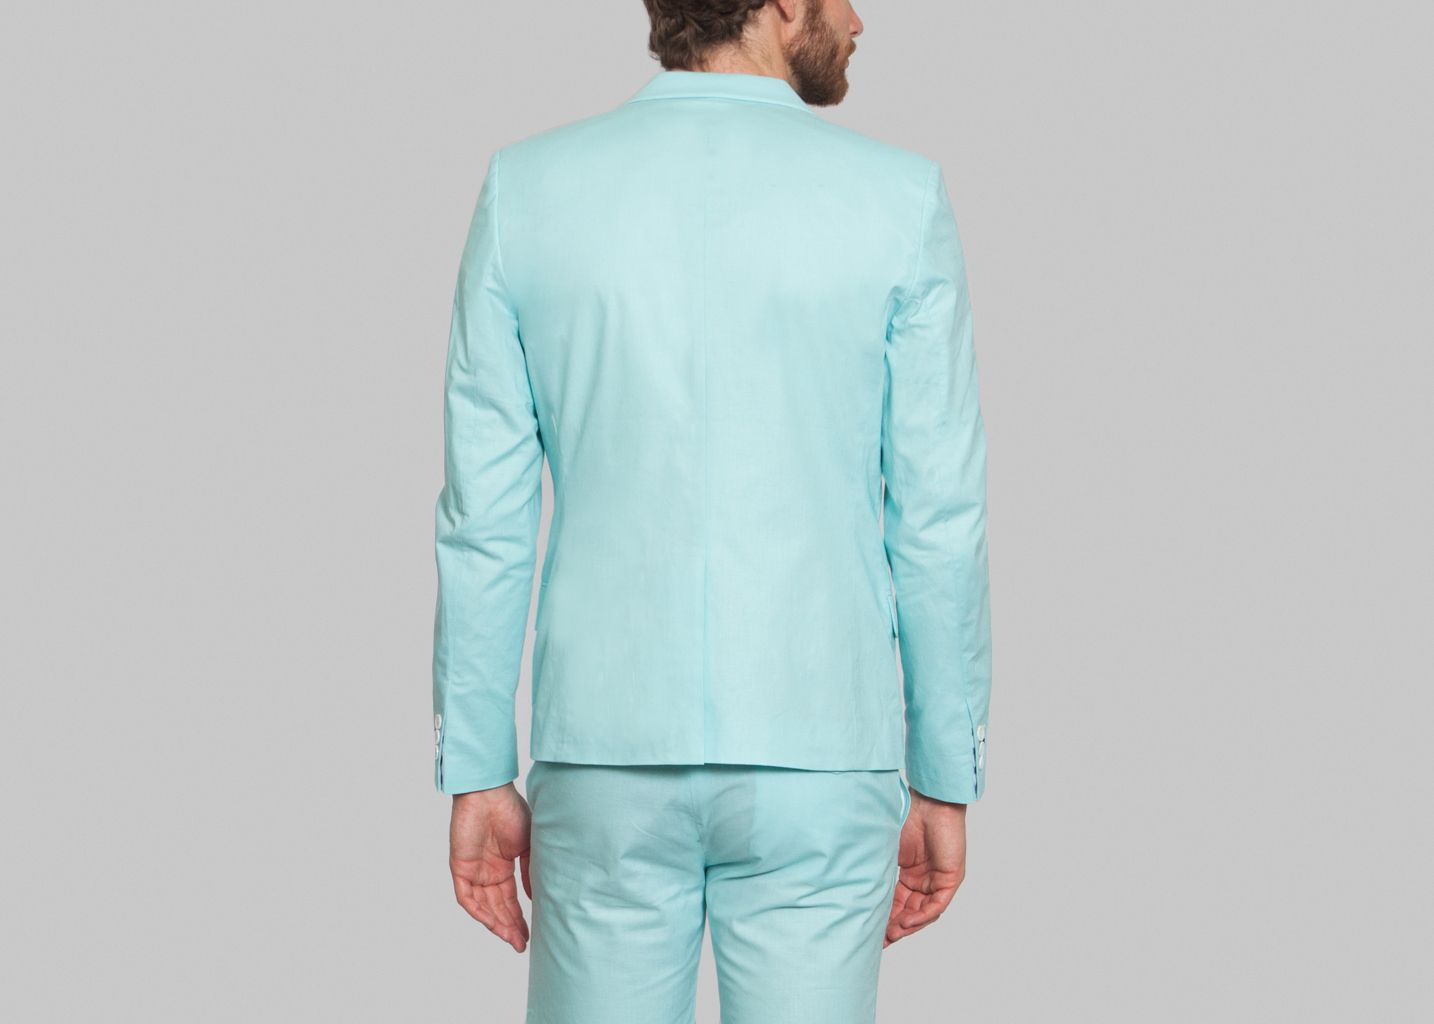 Blazer Palmier - Cavalier Bleu